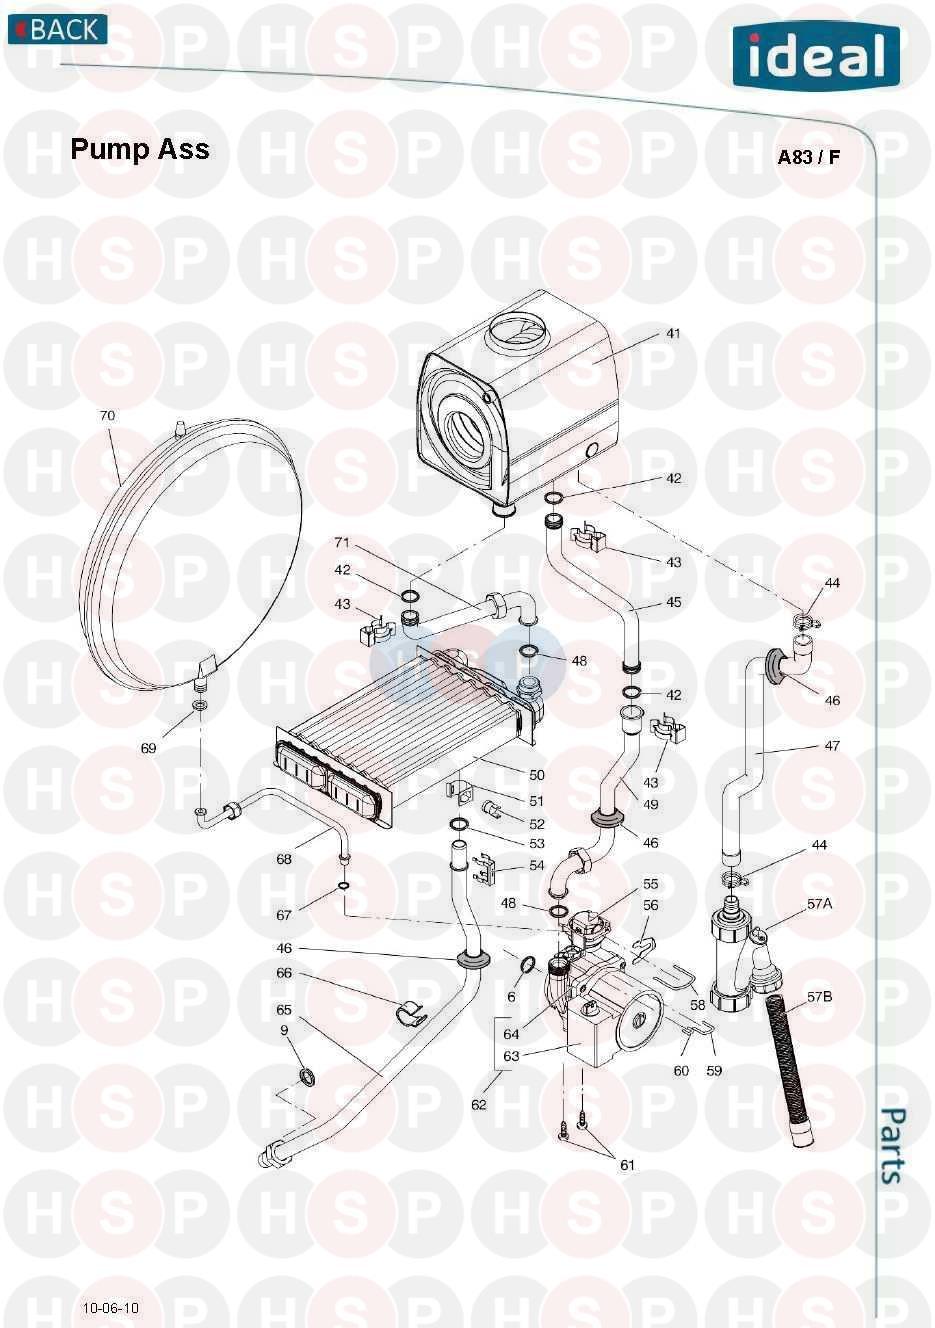 ideal mini he c28 appliance diagram  pump